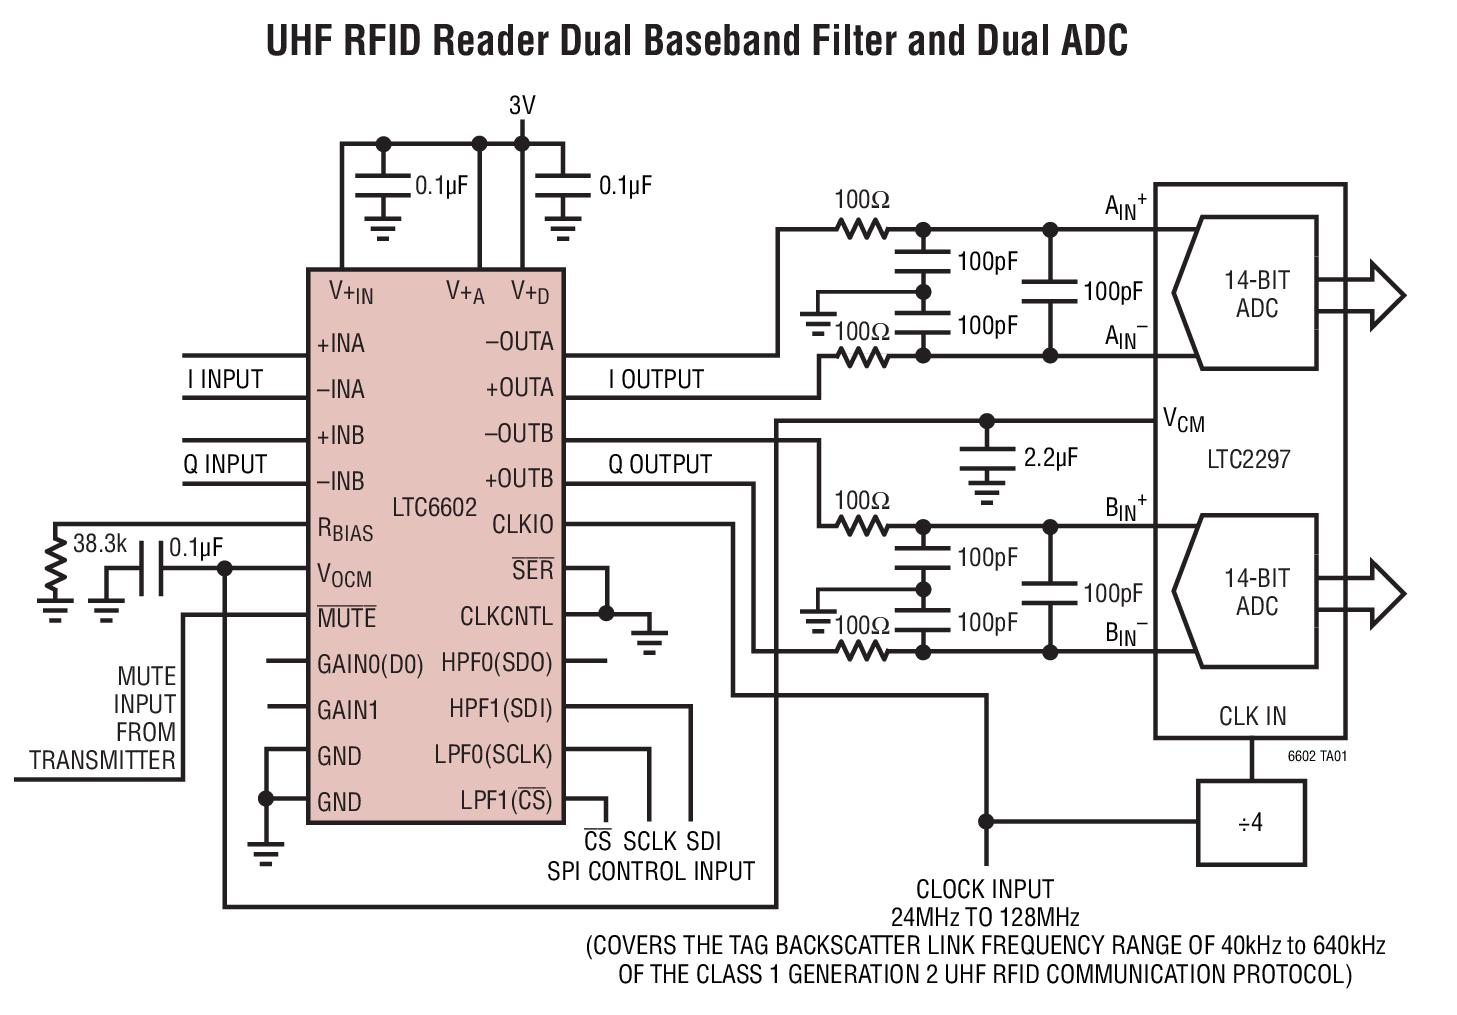 LTC6602 是一款双通道、匹配、可编程带通或低通滤波器和差分驱动器。LTC6602 的选择性再加上其相位匹配和动态范围,使其非常适合于 RFID 系统中的滤波处理。凭借通道之间的 2 相位匹配精度,LTC6602 可以在那些需要高度匹配滤波器的应用 (例如:收发器 I 和 Q 通道) 中使用。由于具有增益可编程性以及全差分输入和输出,因而简化了大多数系统中的实现方案。 LTC6602 的两个通道均包括一个可编程低通和高通滤波器。如需起带通作用,则把低通滤波器为高频截止频率设置。如需起低通作用,则可把